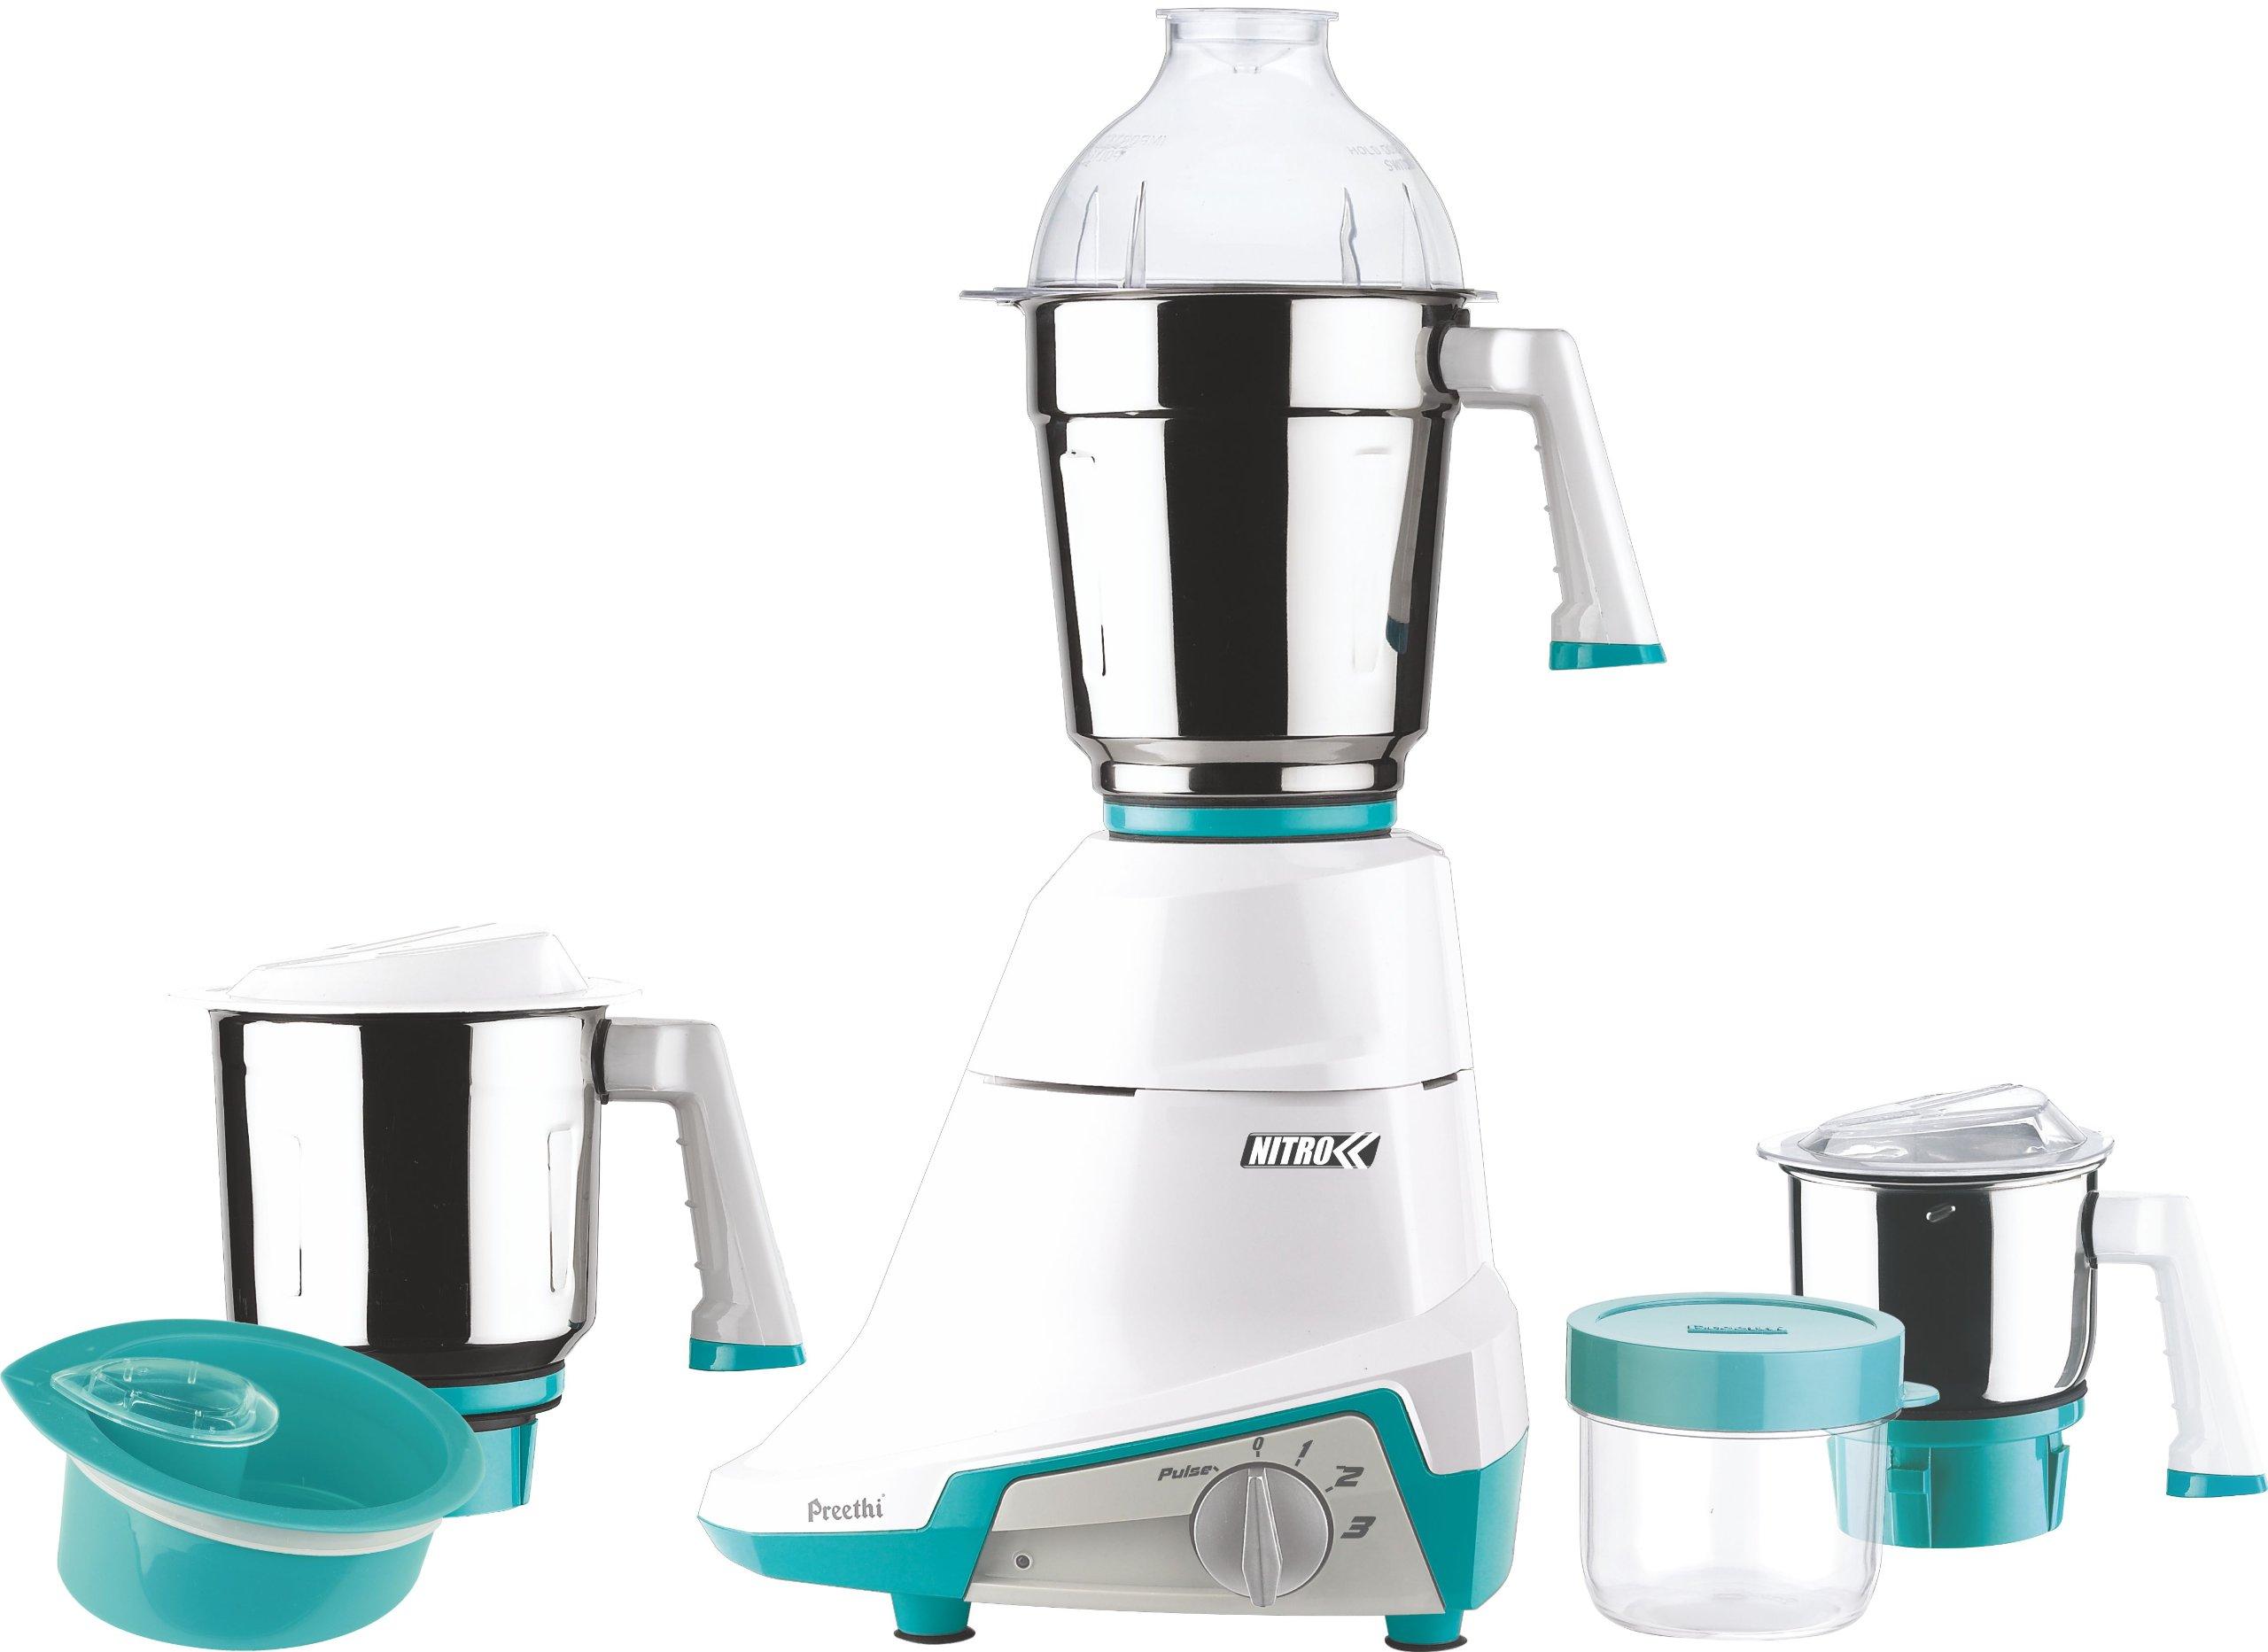 Preethi Nitro 3-Jar Mixer Grinder, 550-Watt